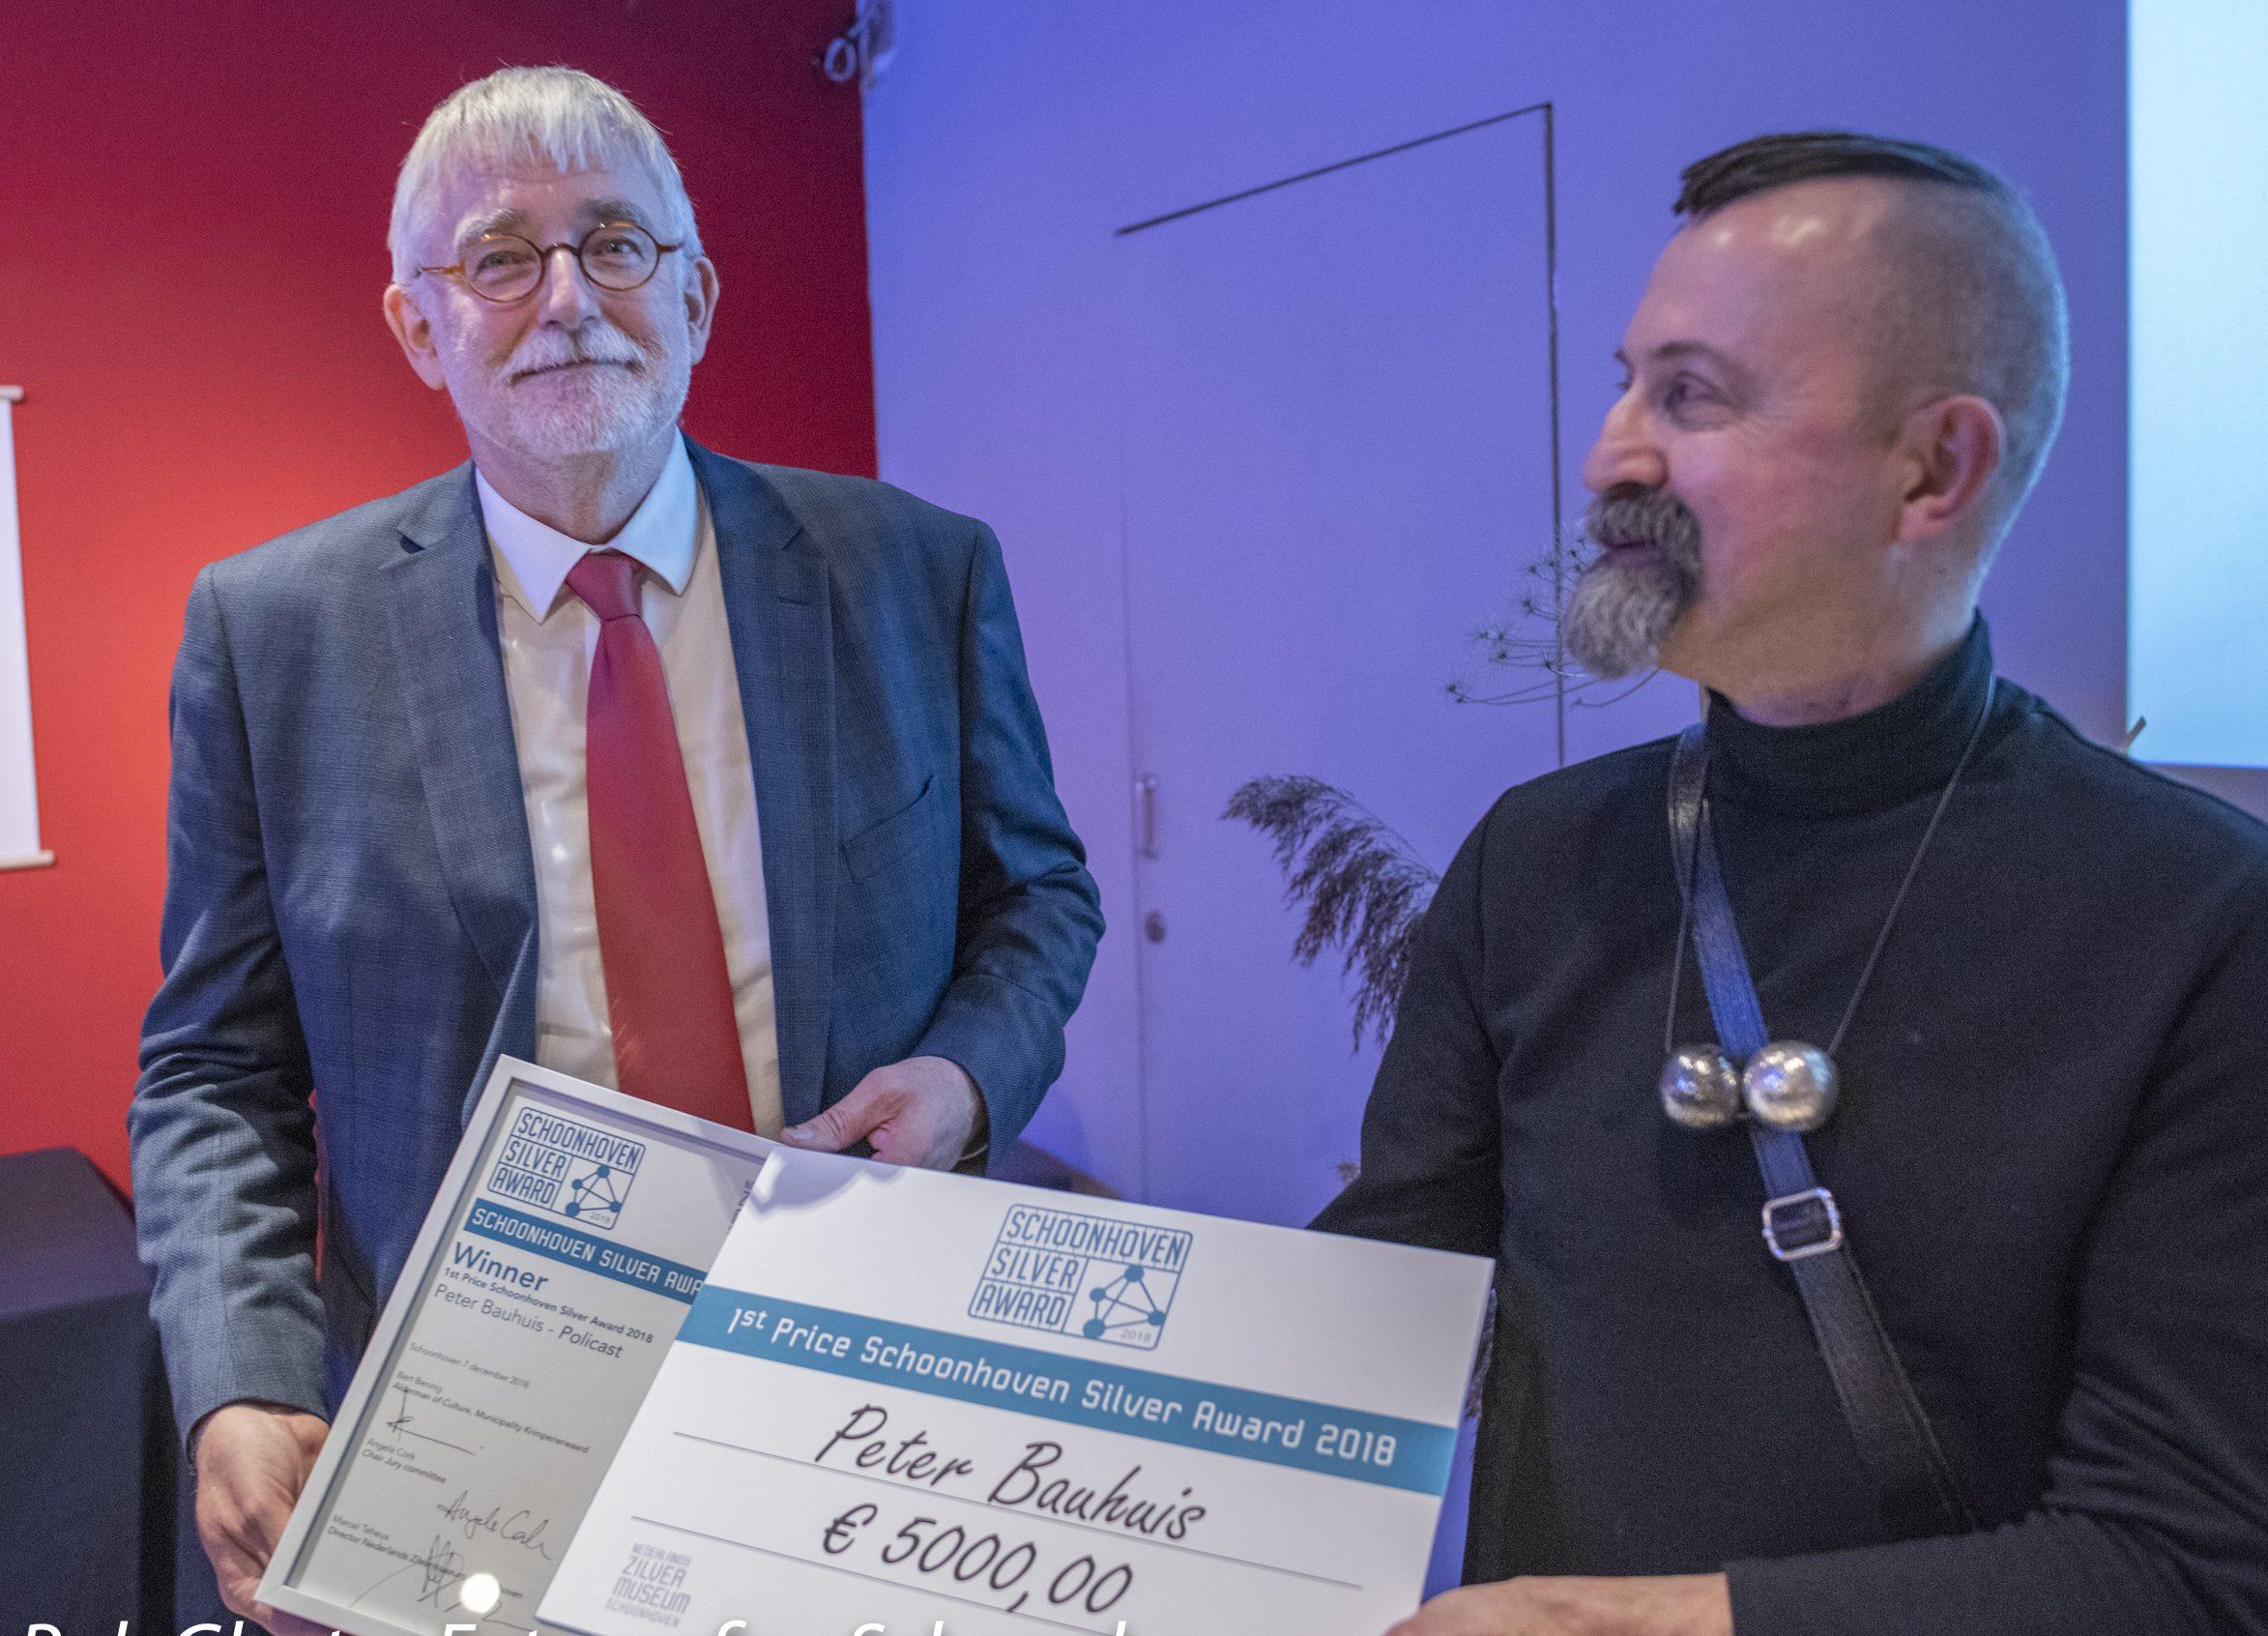 Paul Derrez neemt de Schoonhoven Silver Award in ontvangst namens Peter Bauhuis, 2018, foto Rob Glastra, portret, halssieraad, ziver, koord